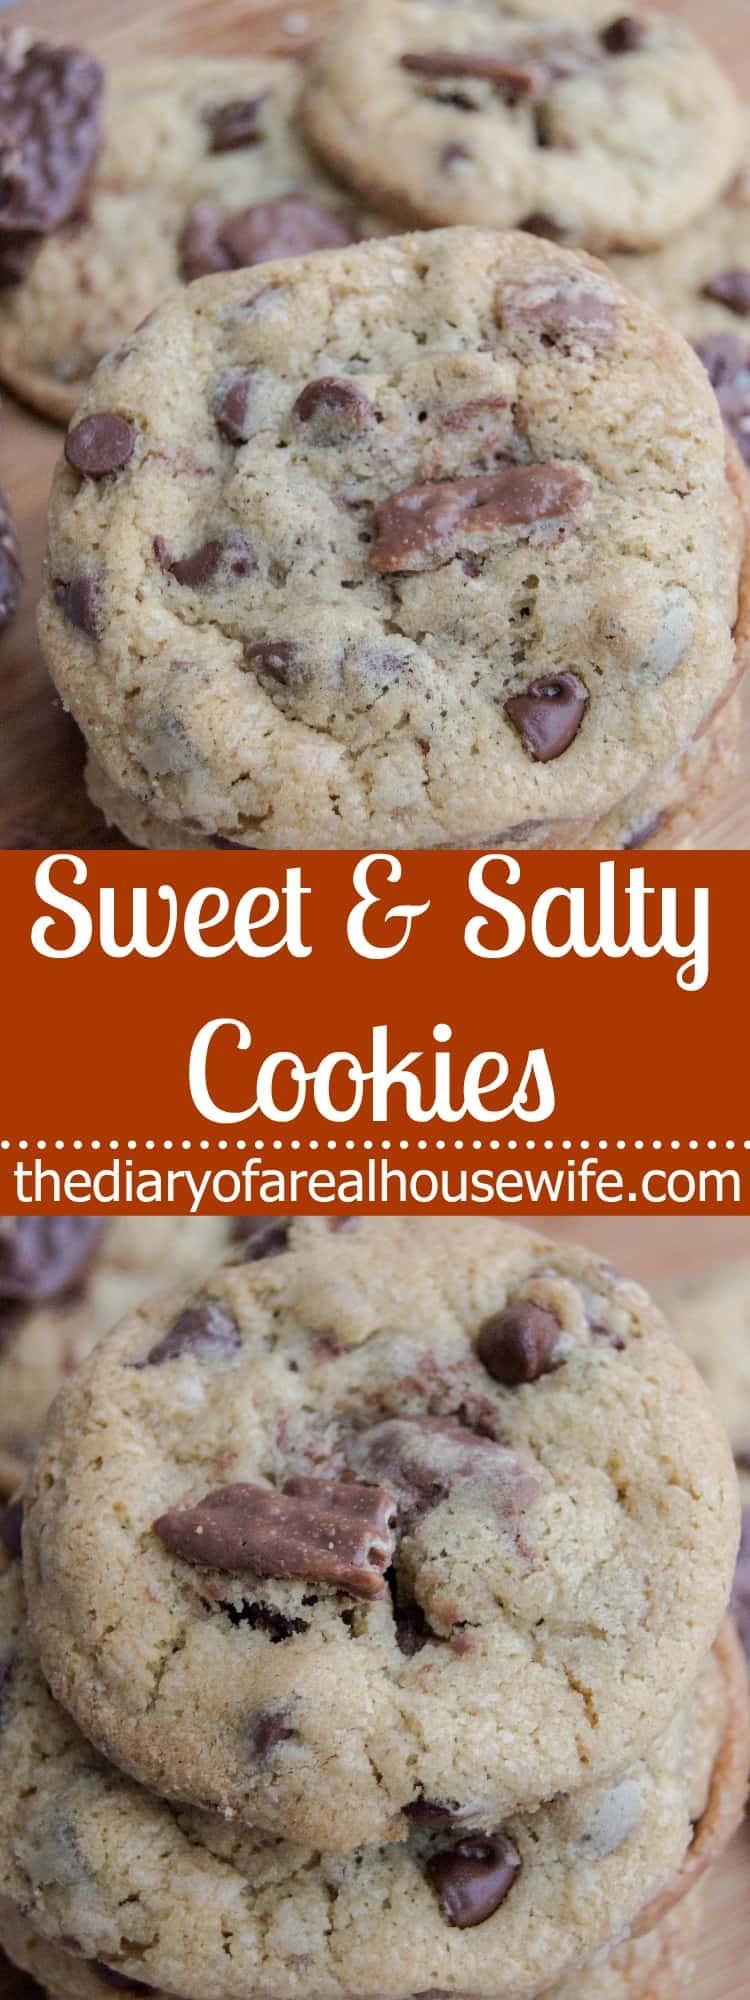 sweet-and-salty-cookies